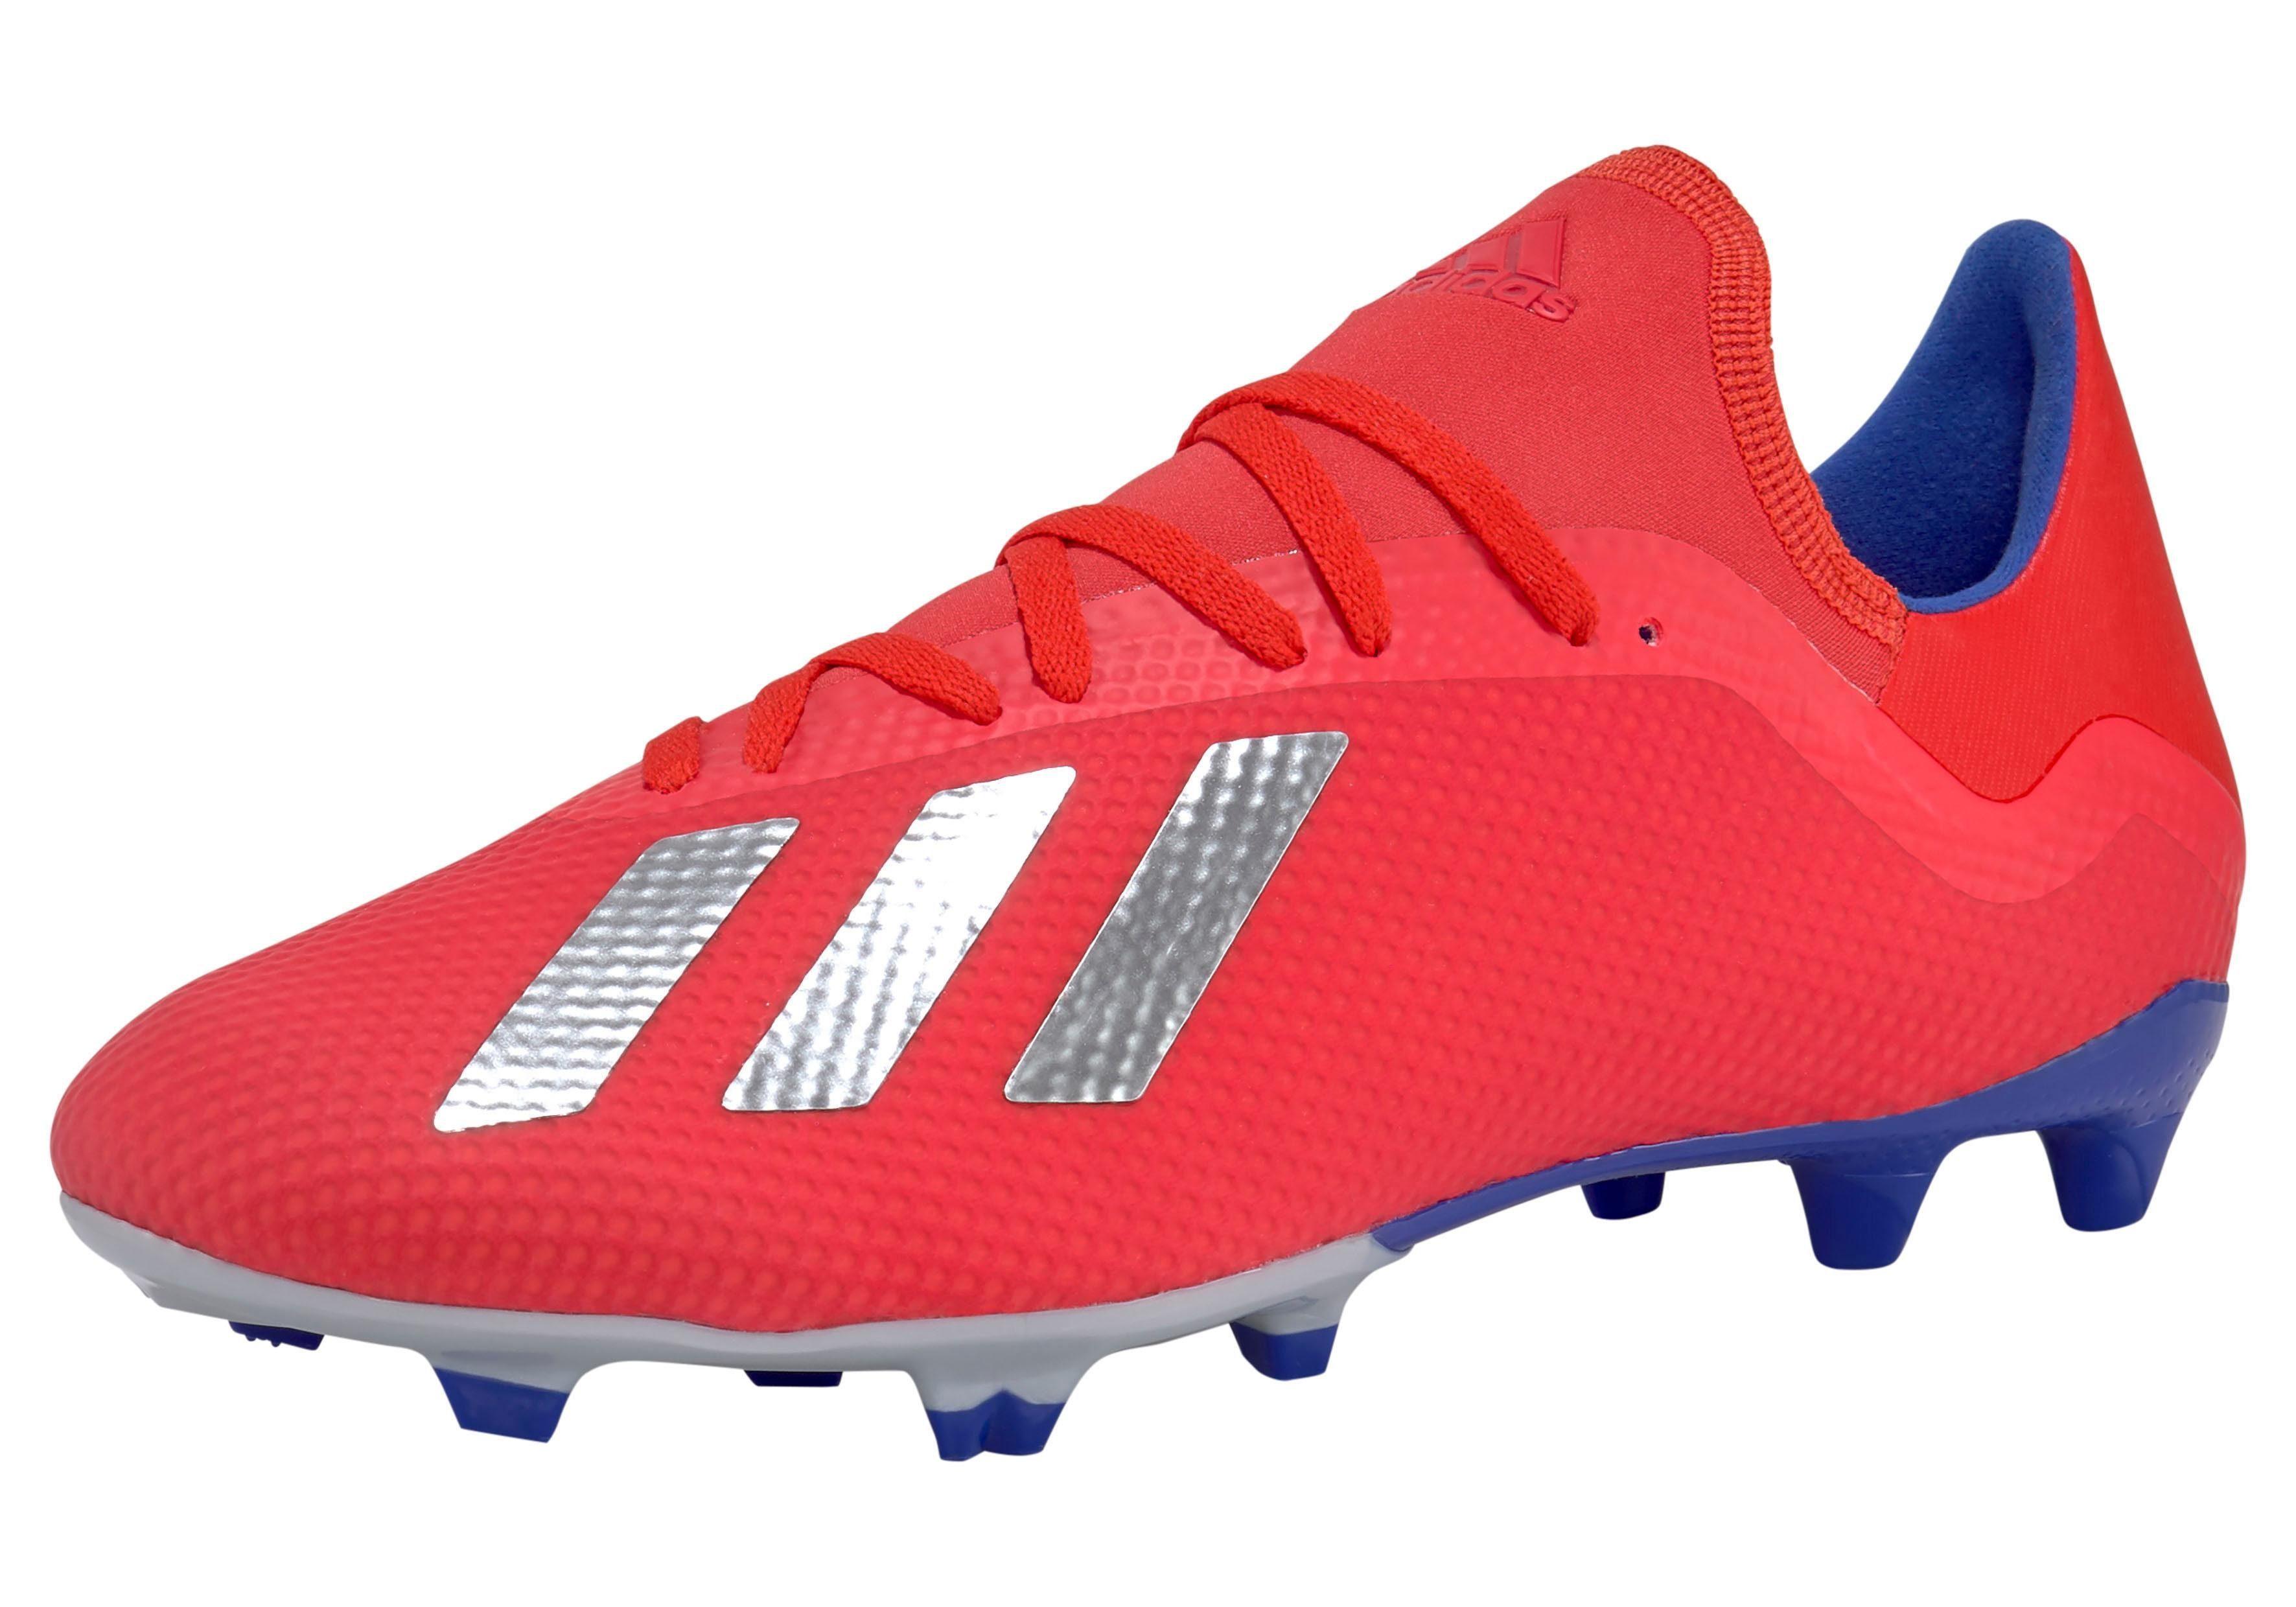 Adidas performance X 18.3 FG J voetbalschoenen roodblauw